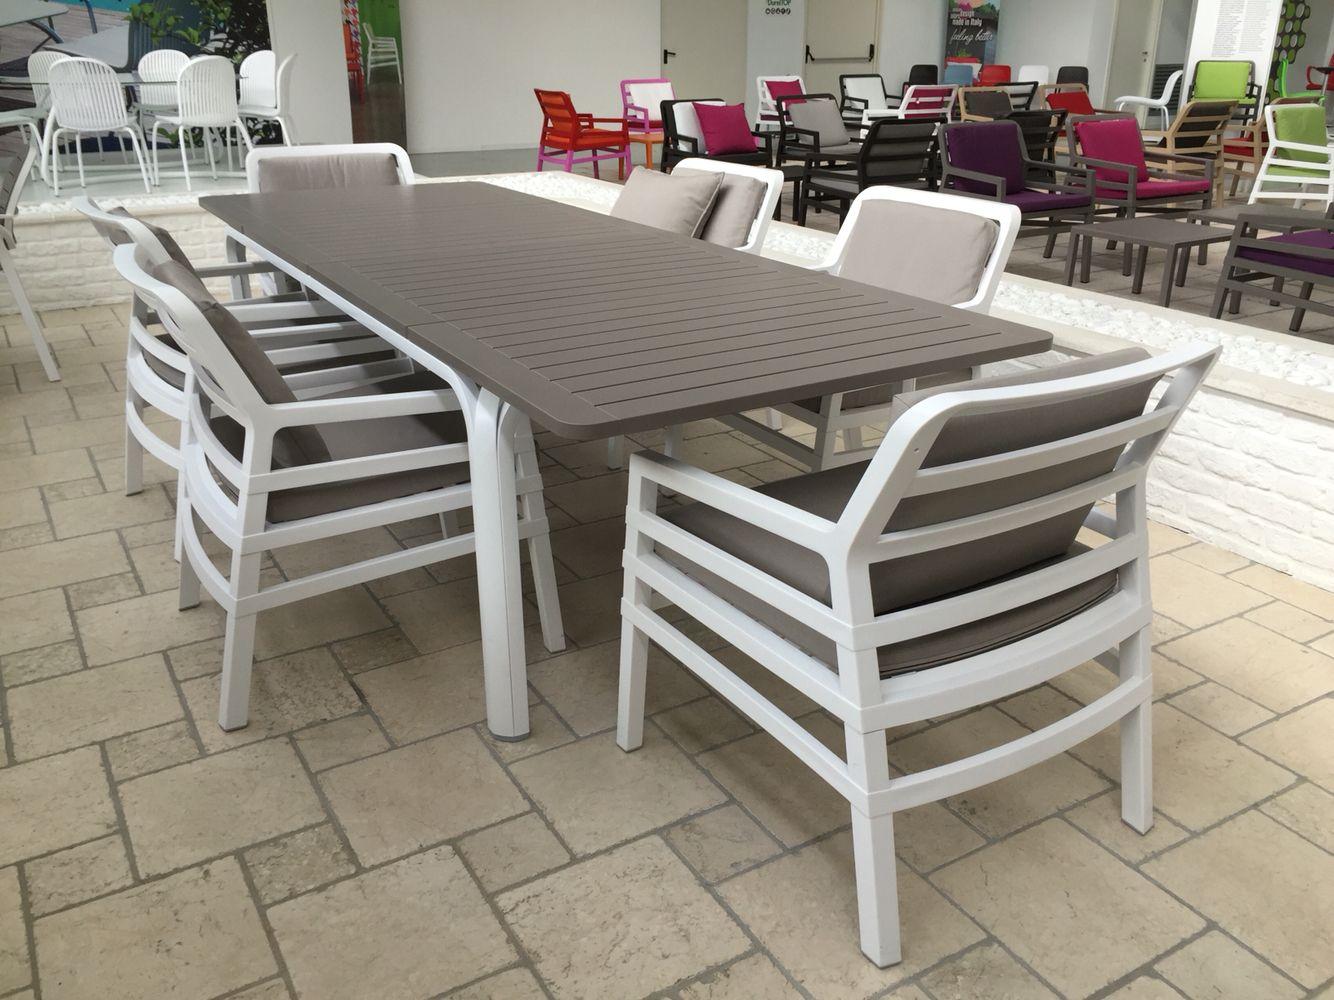 Nardi Mobili ~ Nardi alloro 210 280 extension table with aria chairs outdoor